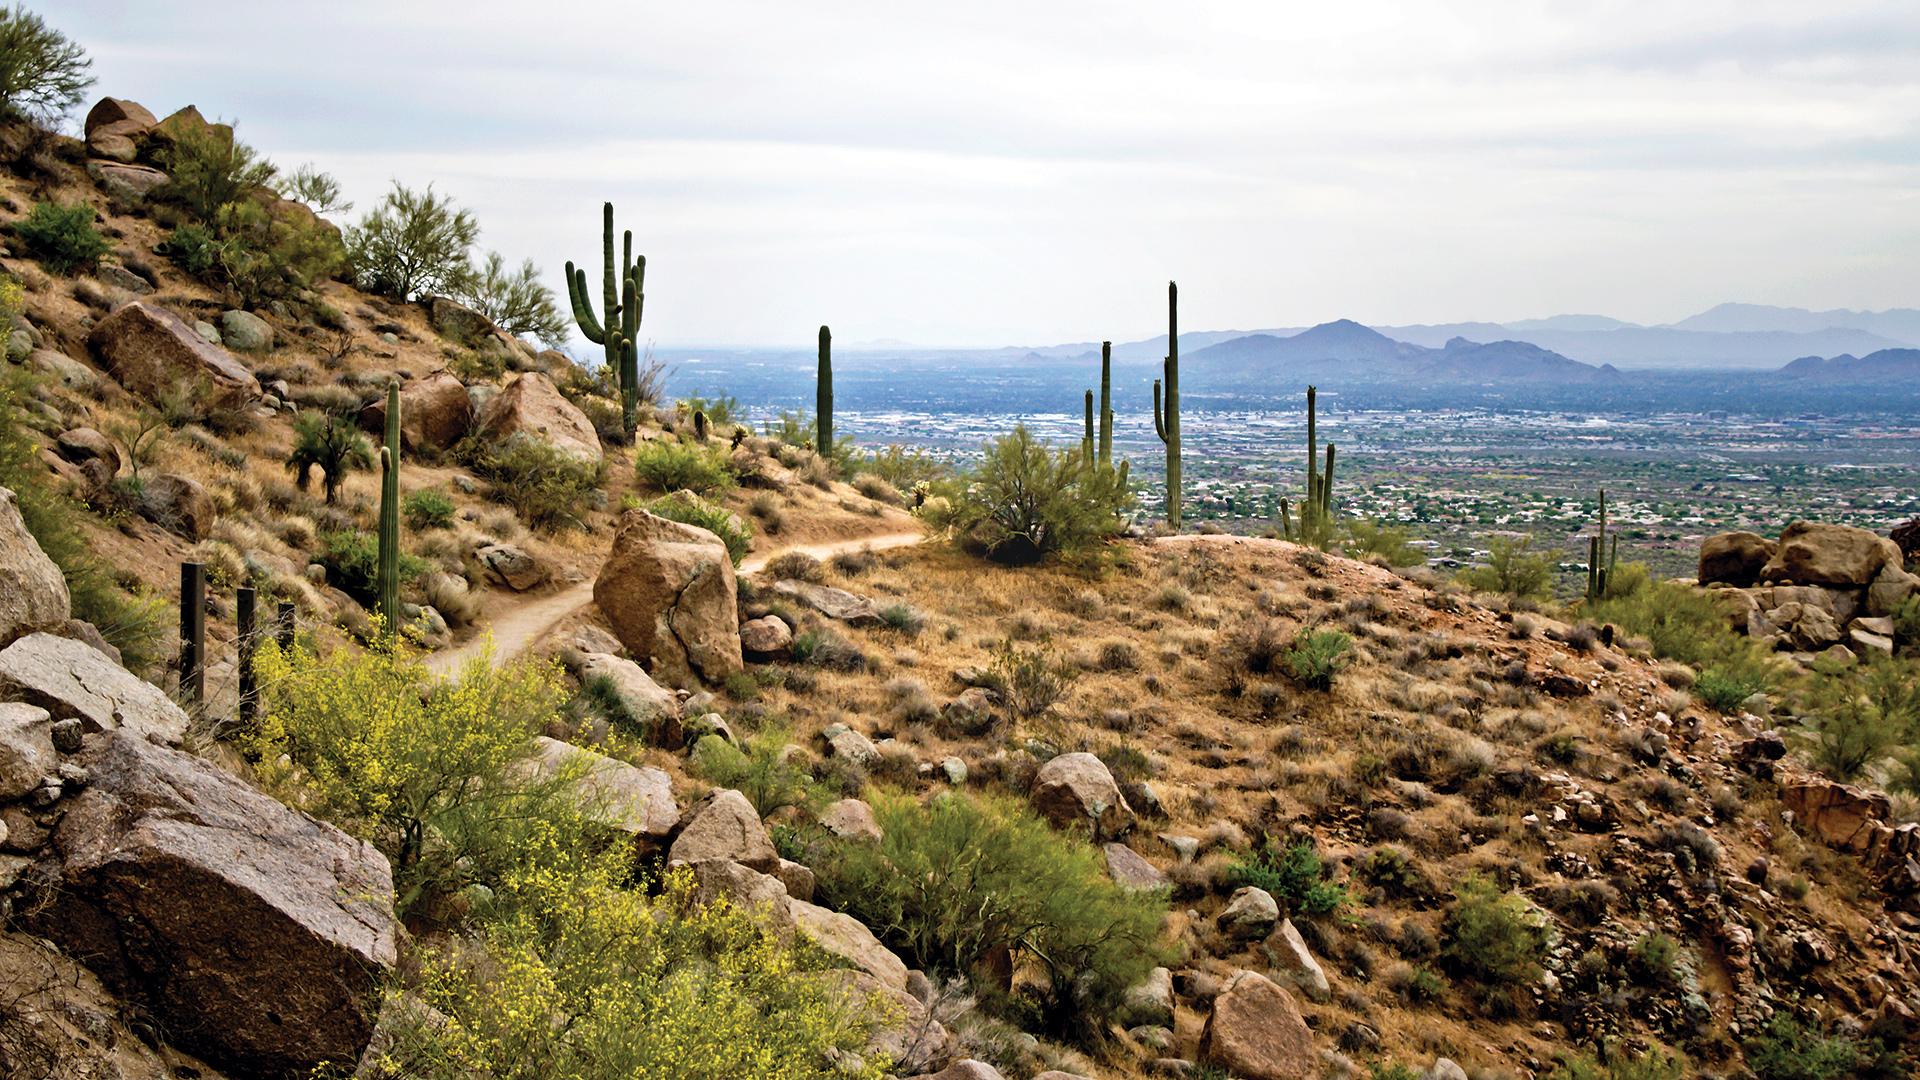 Hiking, biking and walking trails nearby